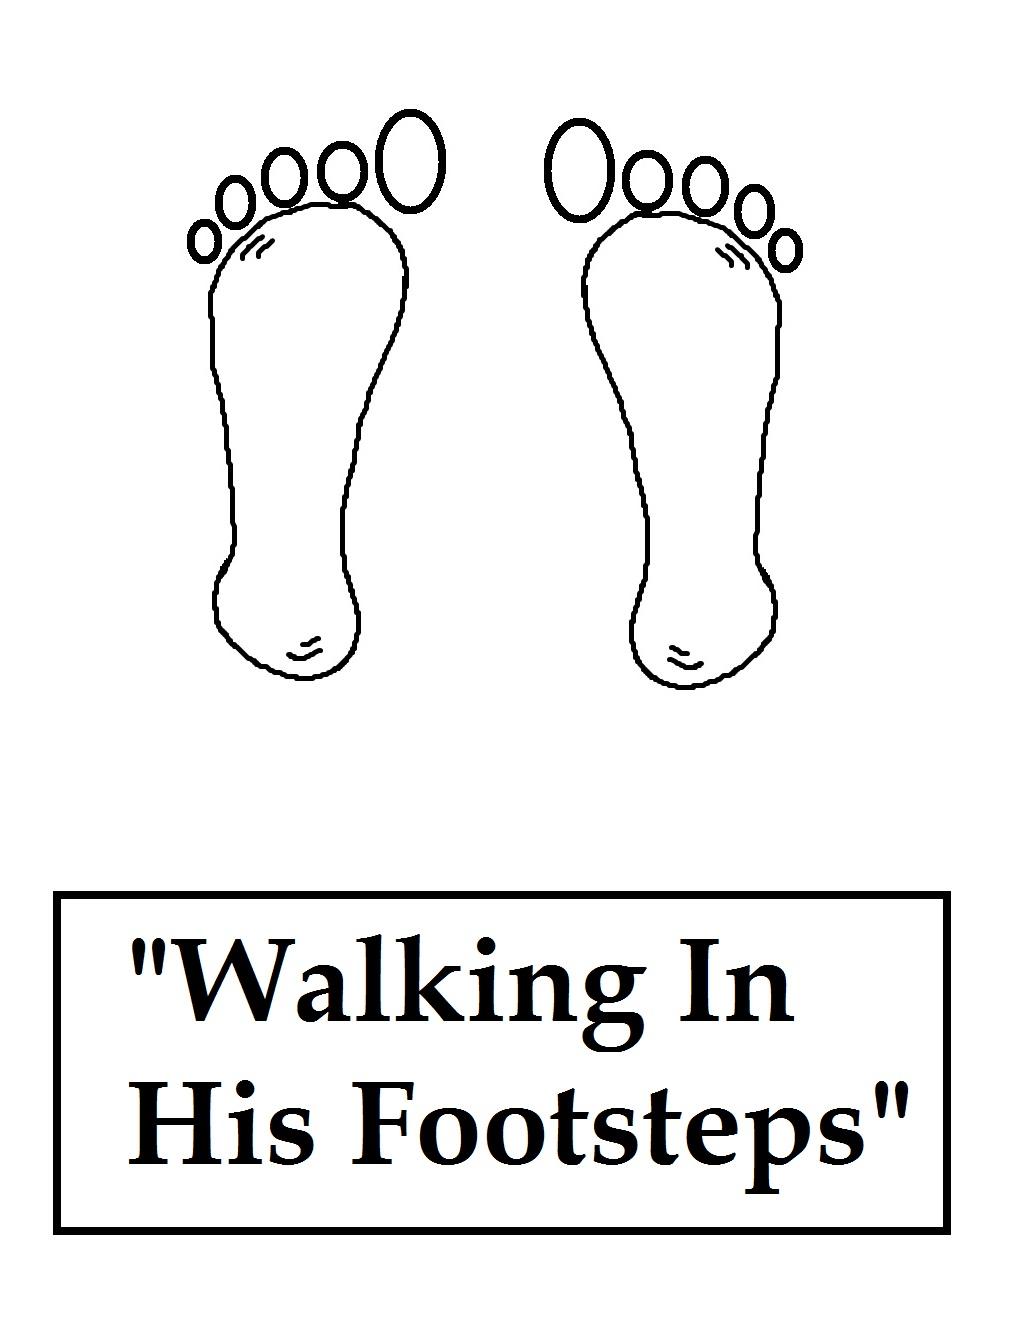 Flip Flop Sunday School Lesson